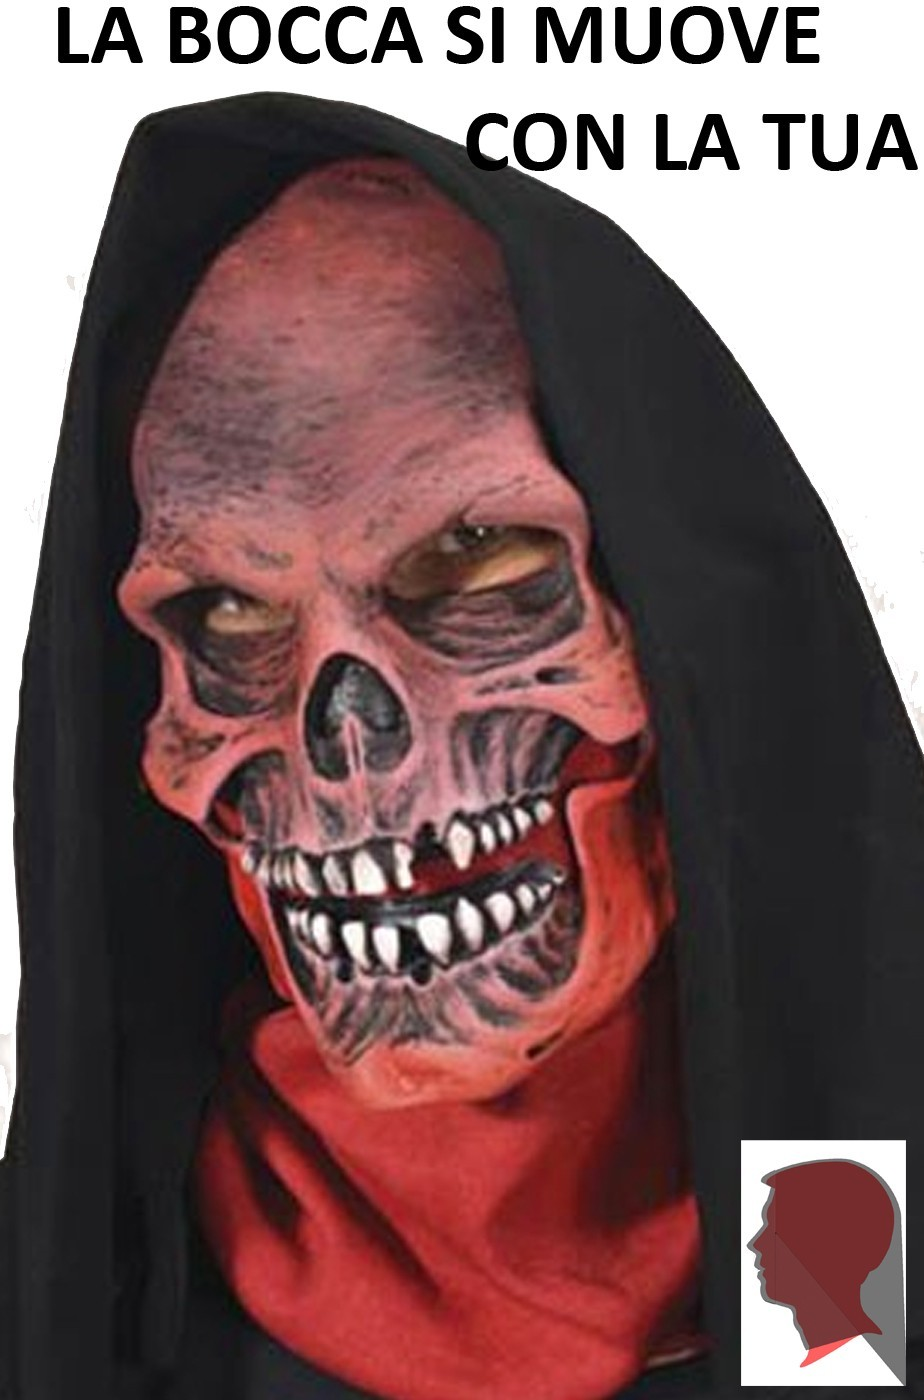 Maschera Teschio Rosso qualità professionale.